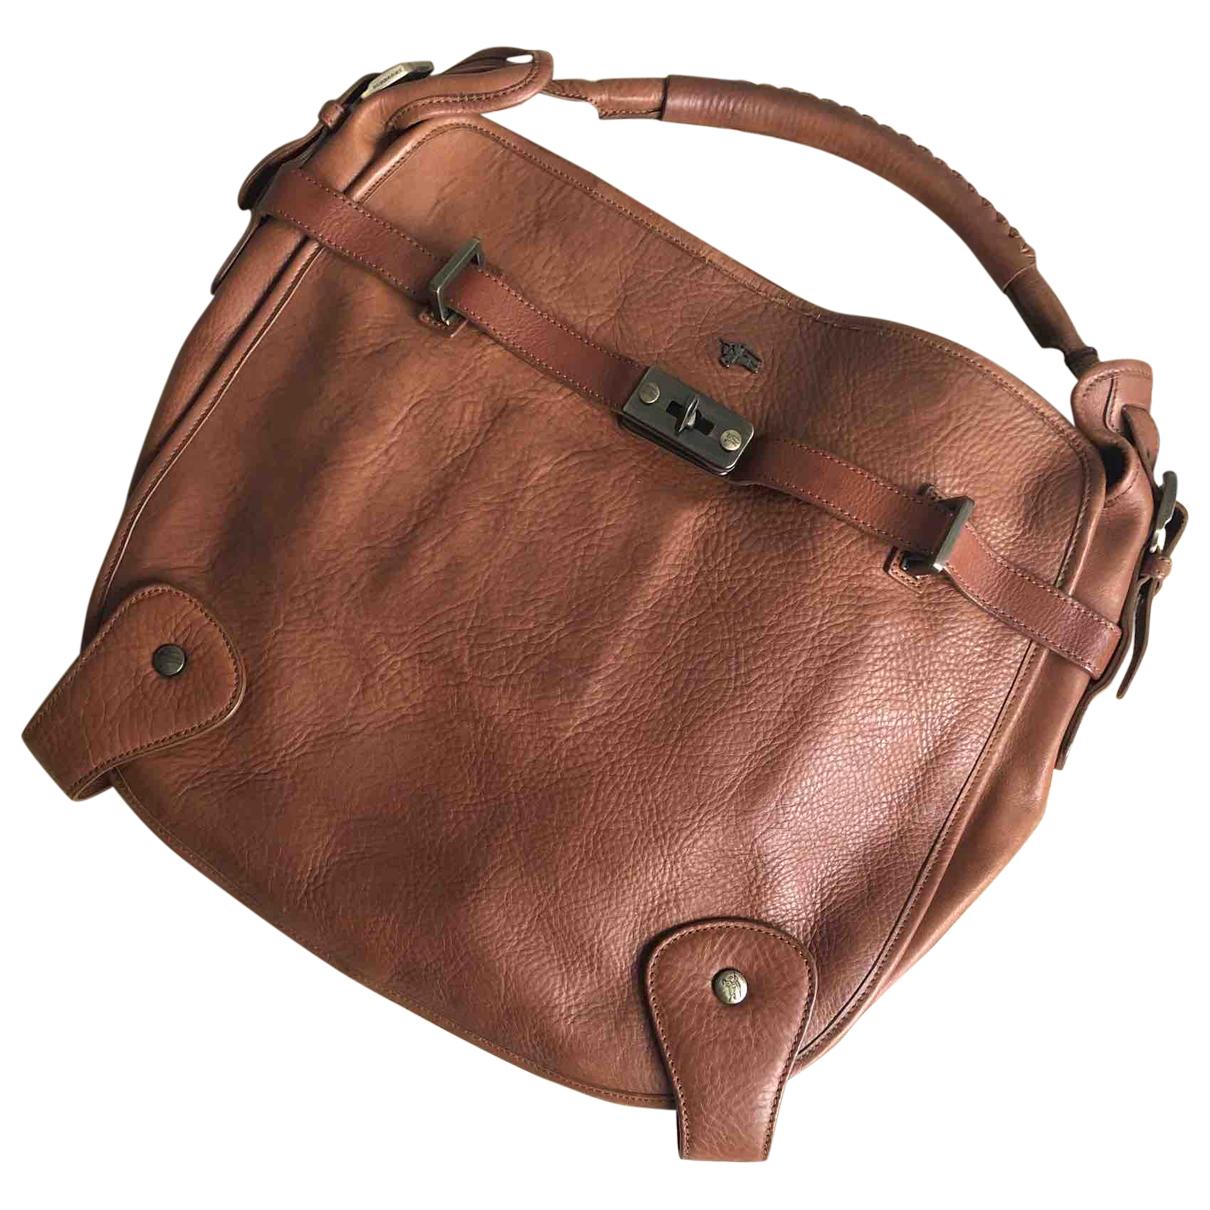 Burberry N Camel Leather handbag for Women N